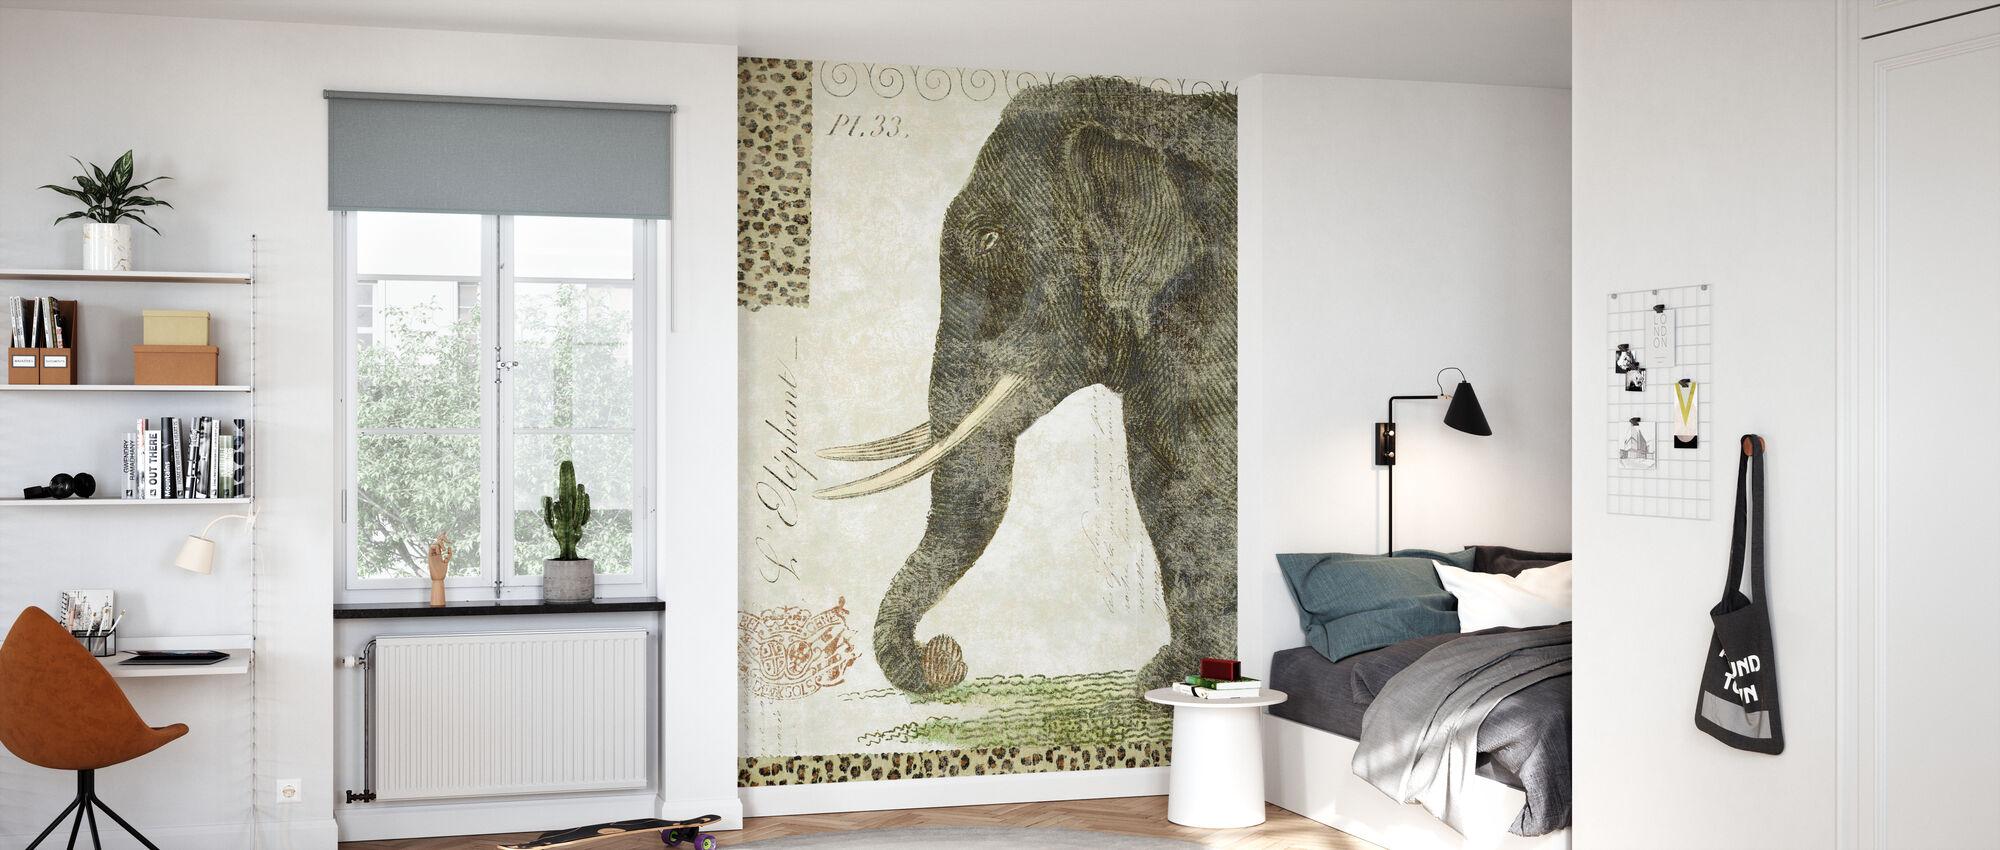 L Elephant - Wallpaper - Kids Room